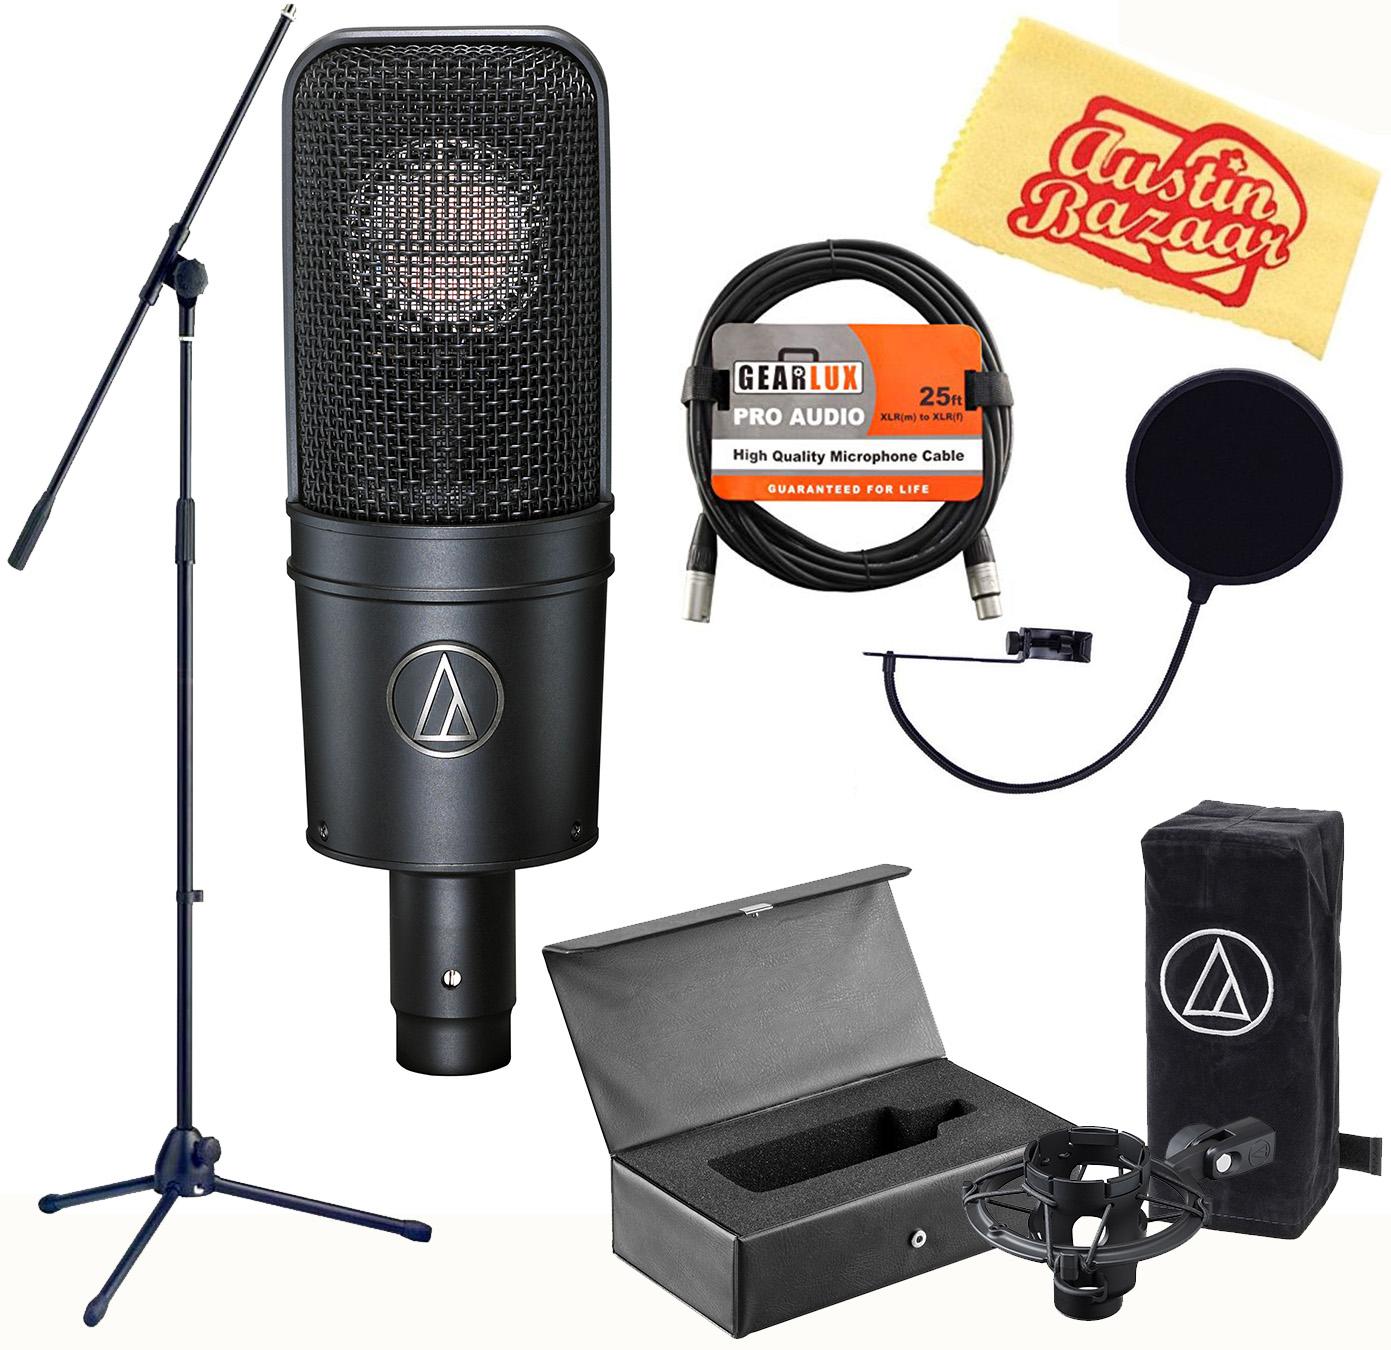 Audio-Technica AT4040 Cardioid Condenser Microphone w/ Boom Stand 42005127955   eBay